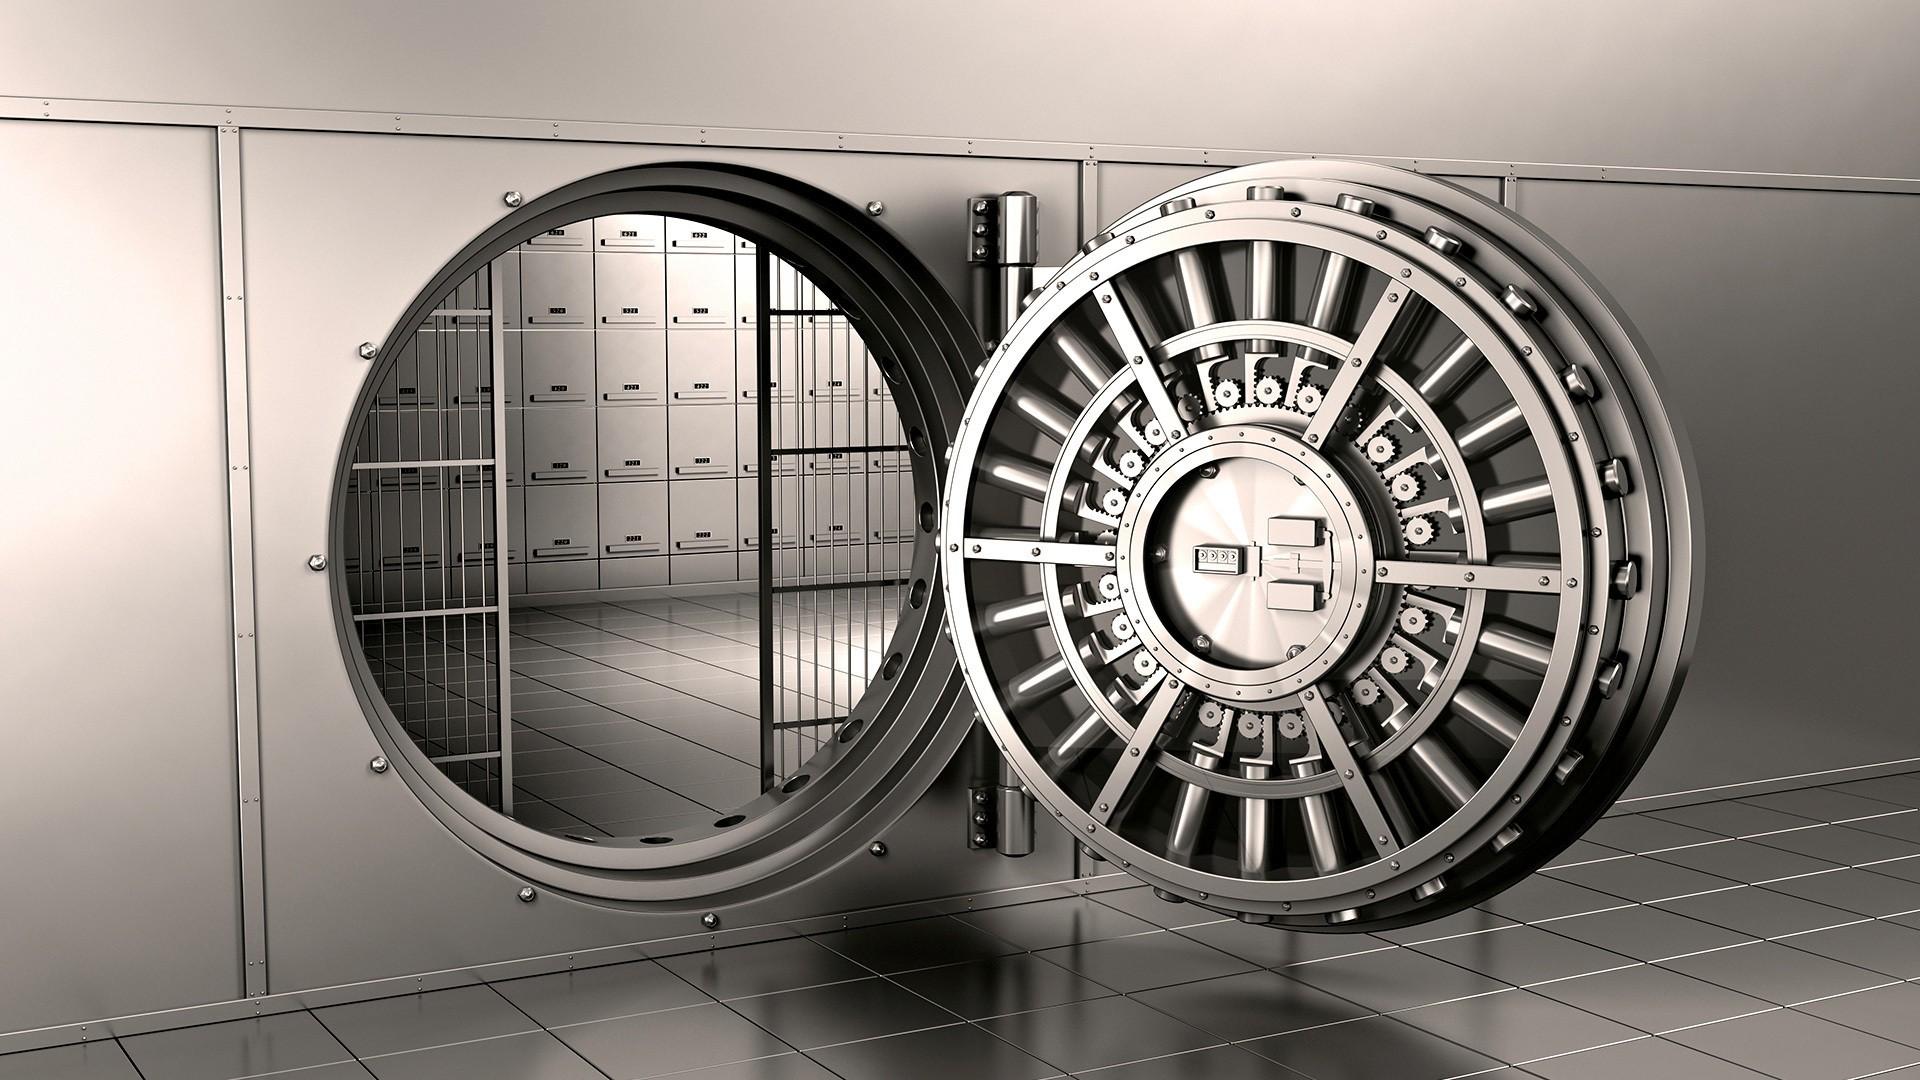 Bank Vault HD Wallpaper Background Image 1920x1080 ID950625 1920x1080